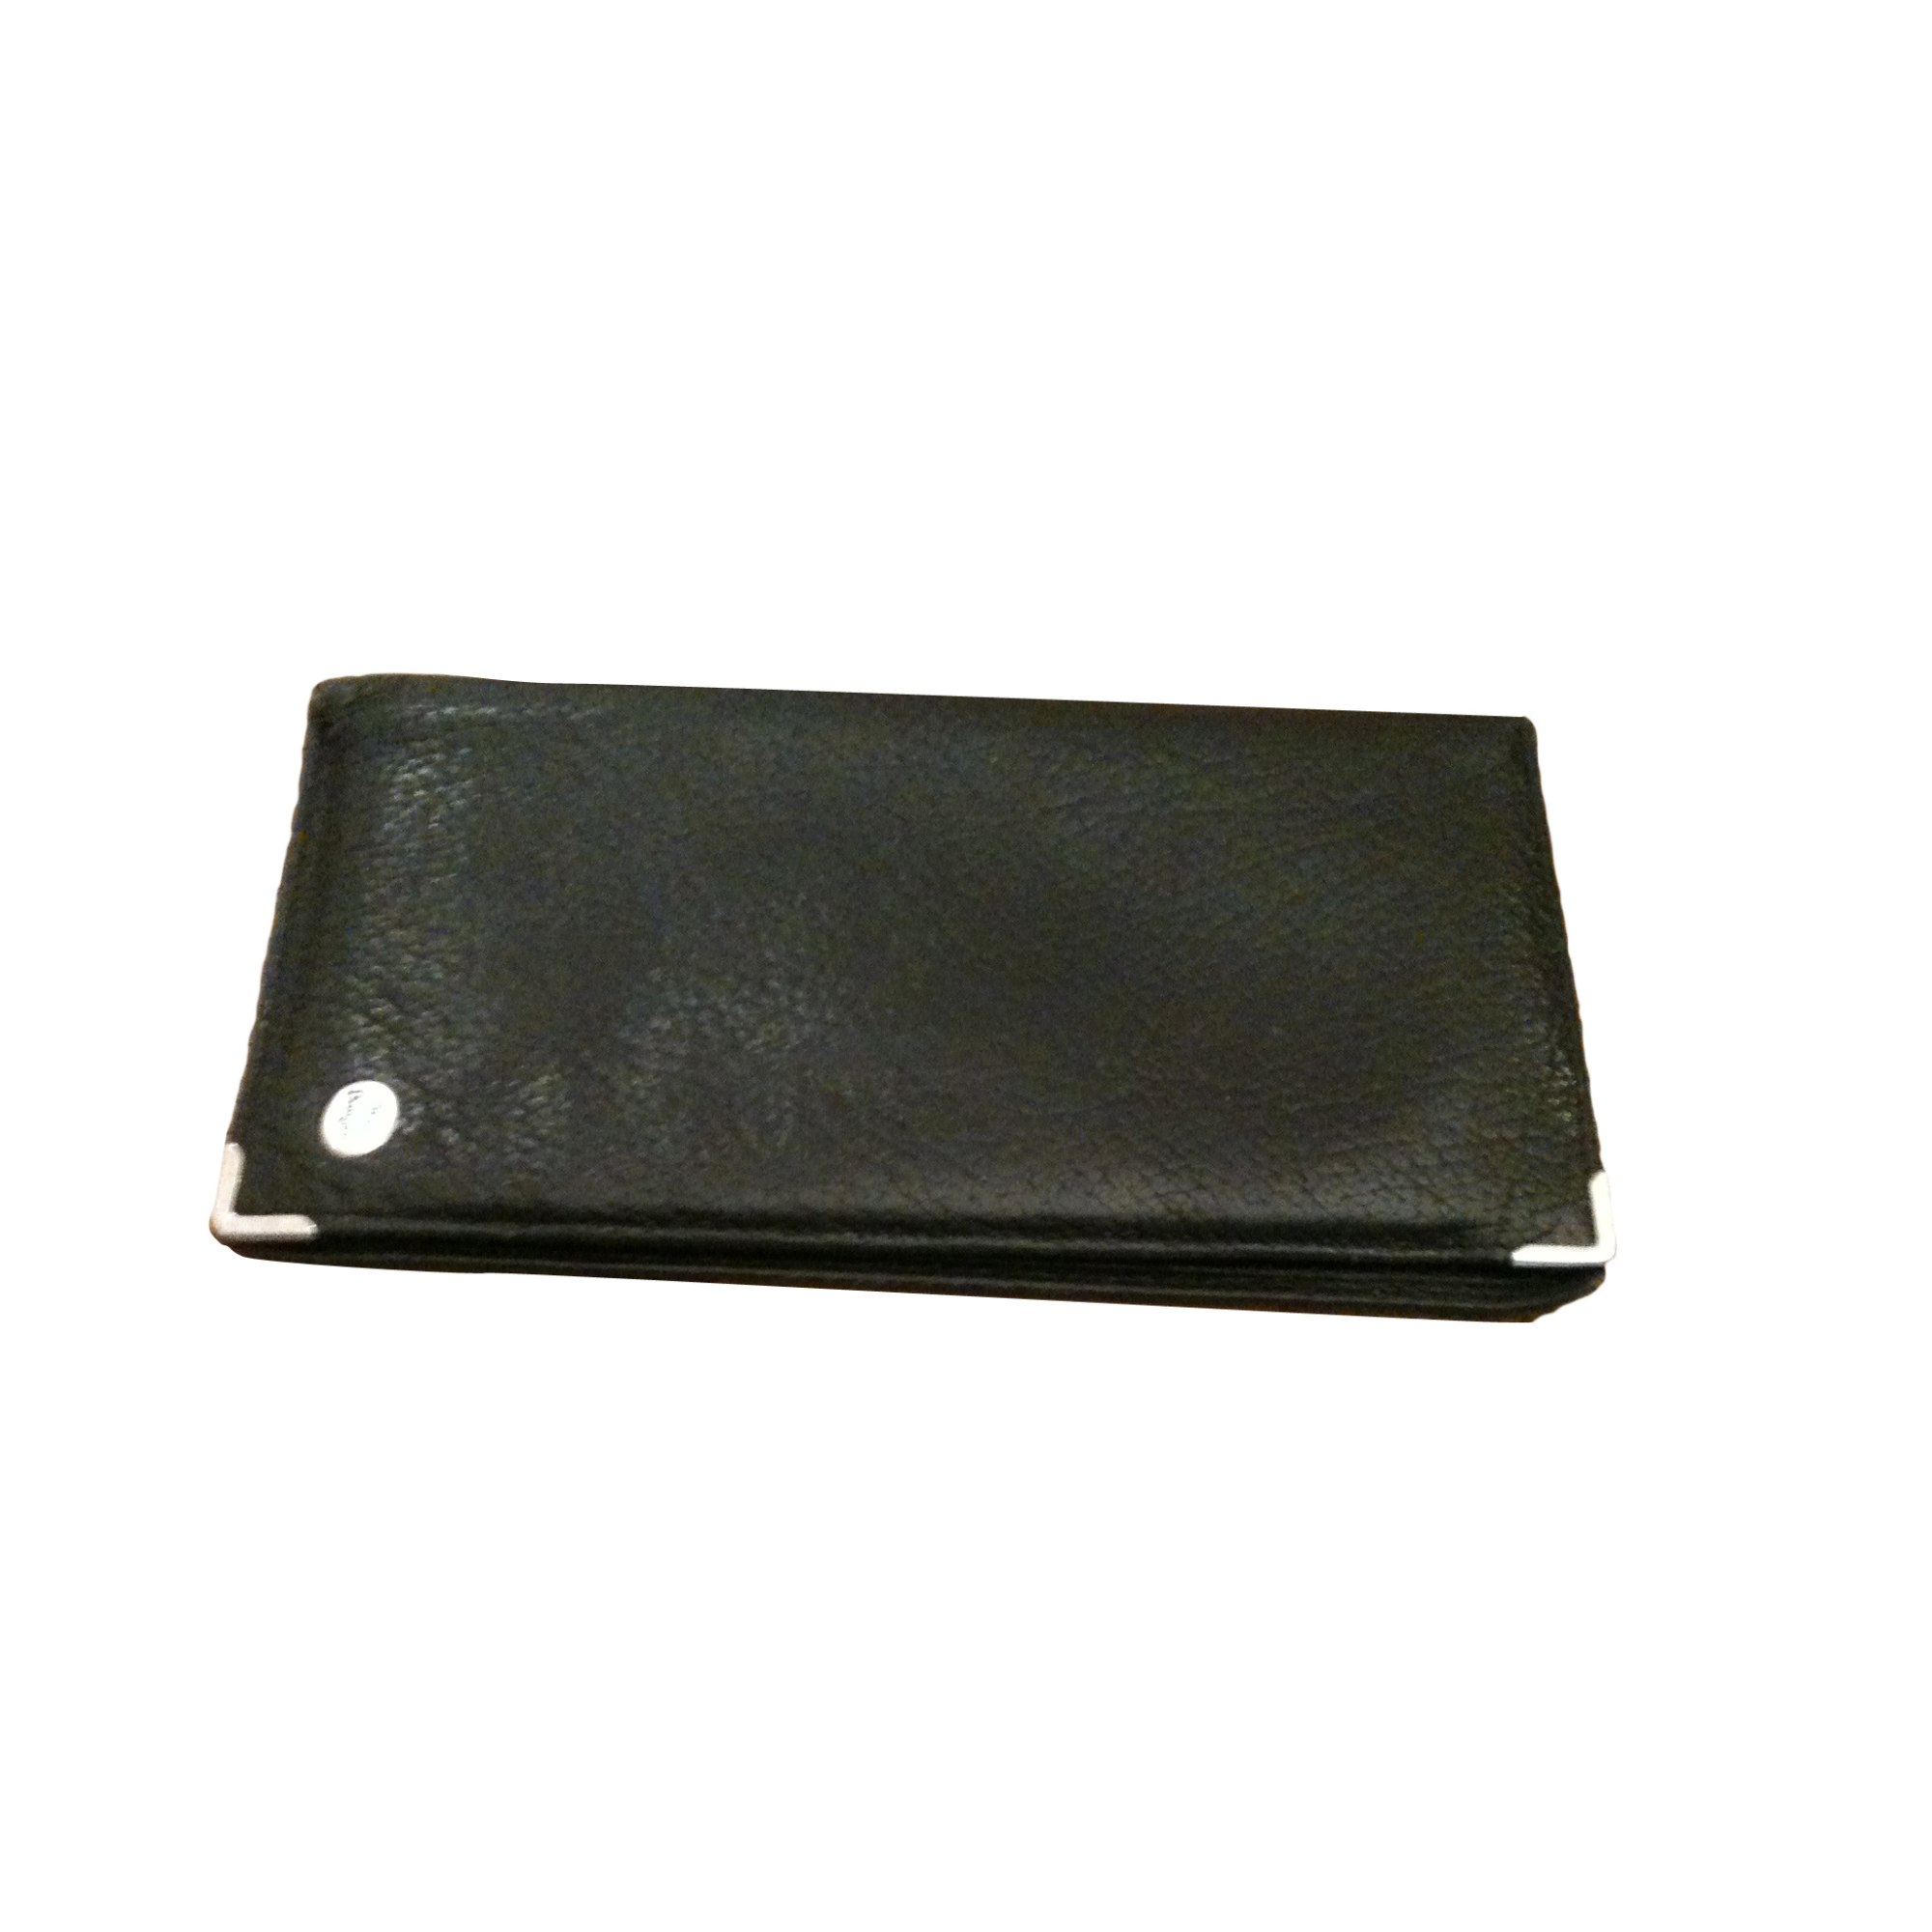 Porte-chéquier MAC DOUGLAS noir vendu par Arbaz69 - 7299479 ddbdecdb405